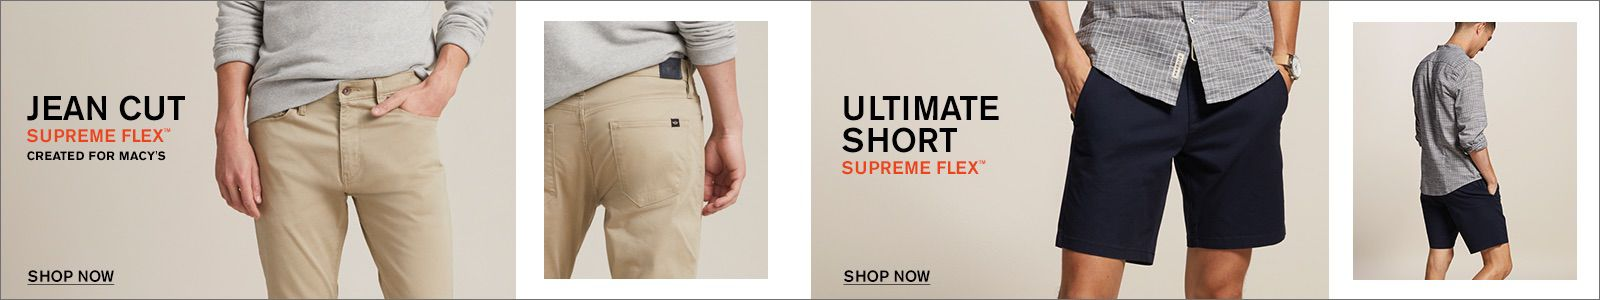 Jean Cut, Supreme Flex, Created For Macy's, Ultimate Short Supreme Flex